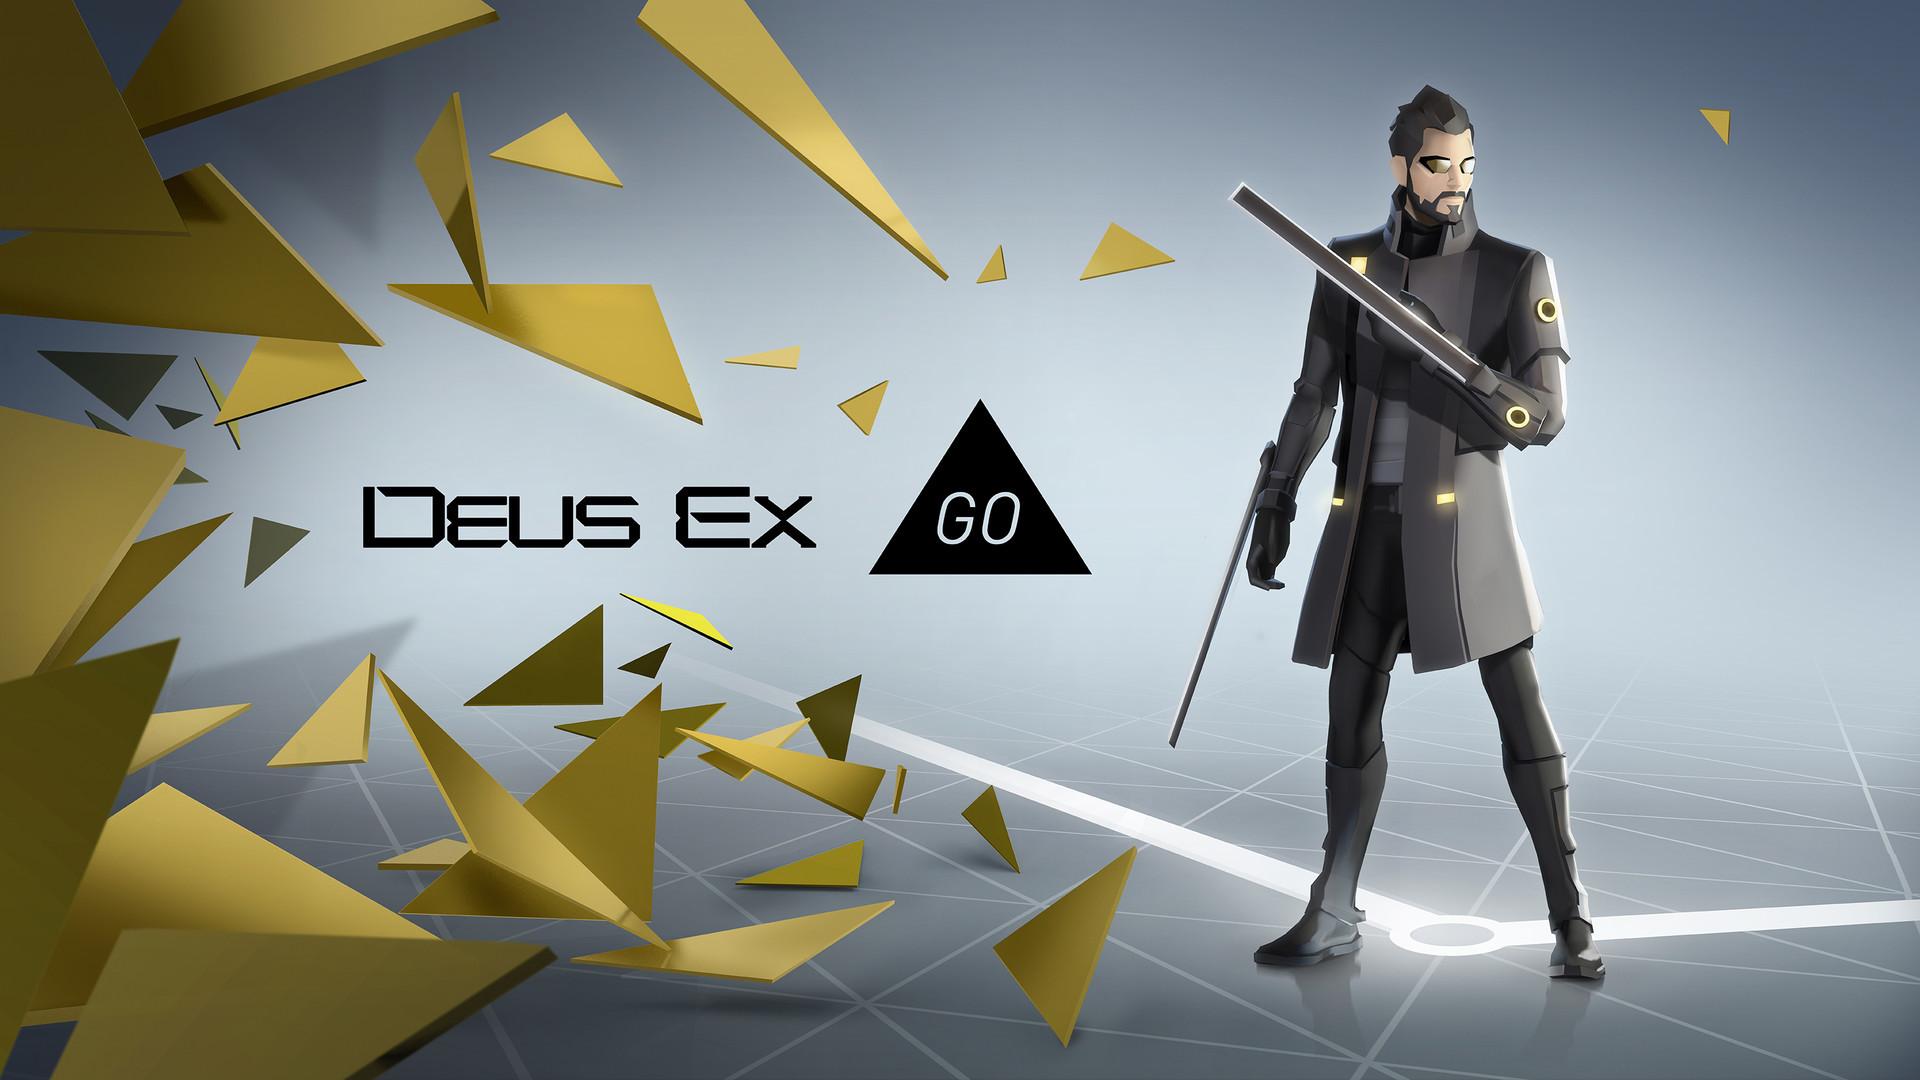 Jan ditlev mood design studio deusex go 01